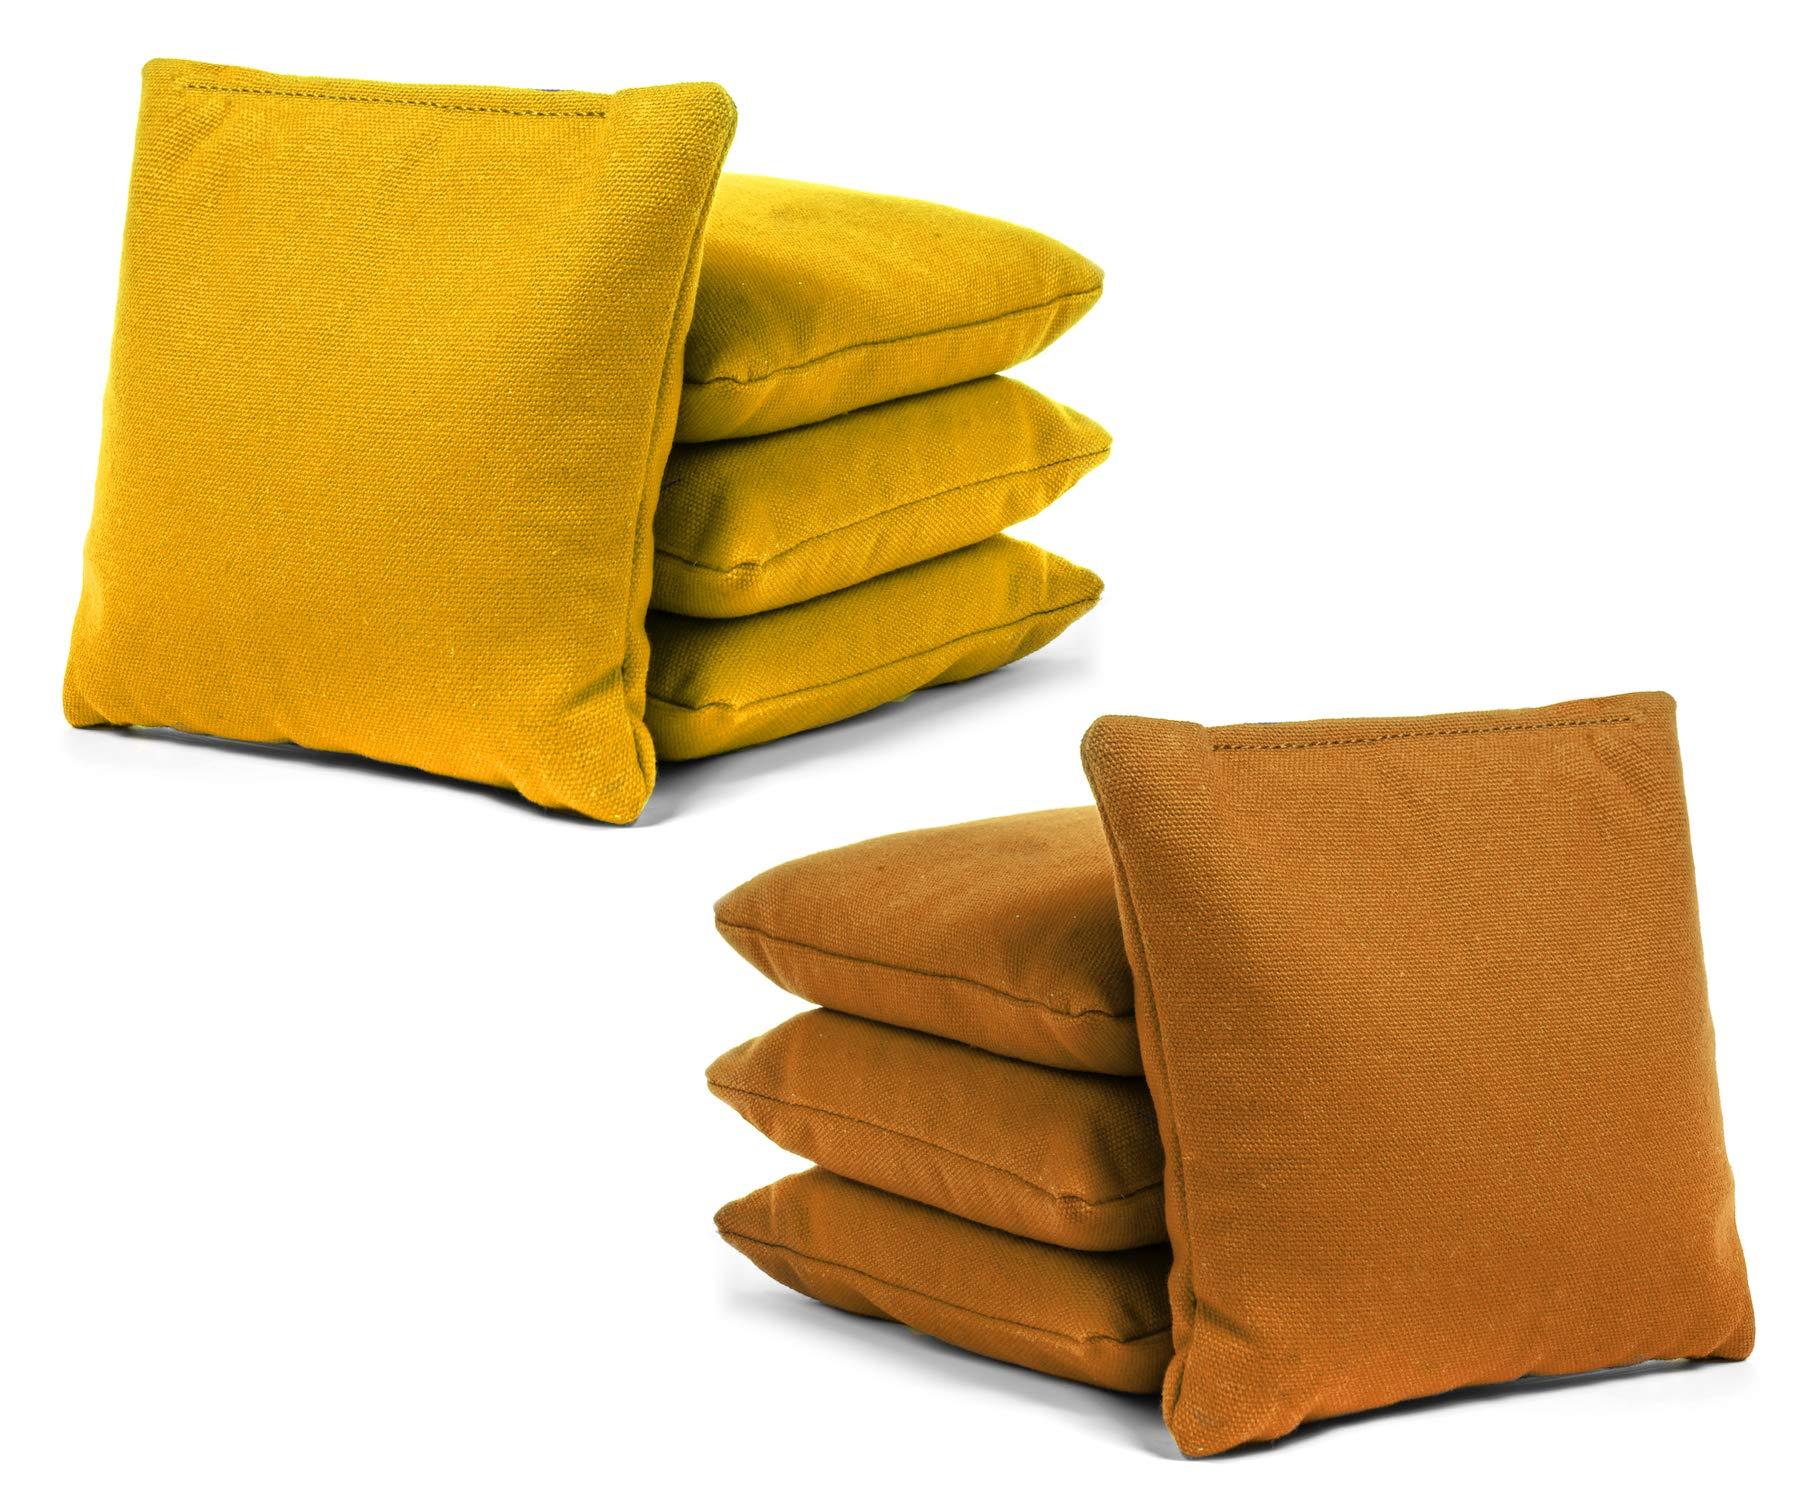 Tailgating Pros Cornhole Bags - 8 Regulation Size Corn Hole Bags - 23+ Colors Options by Tailgating Pros